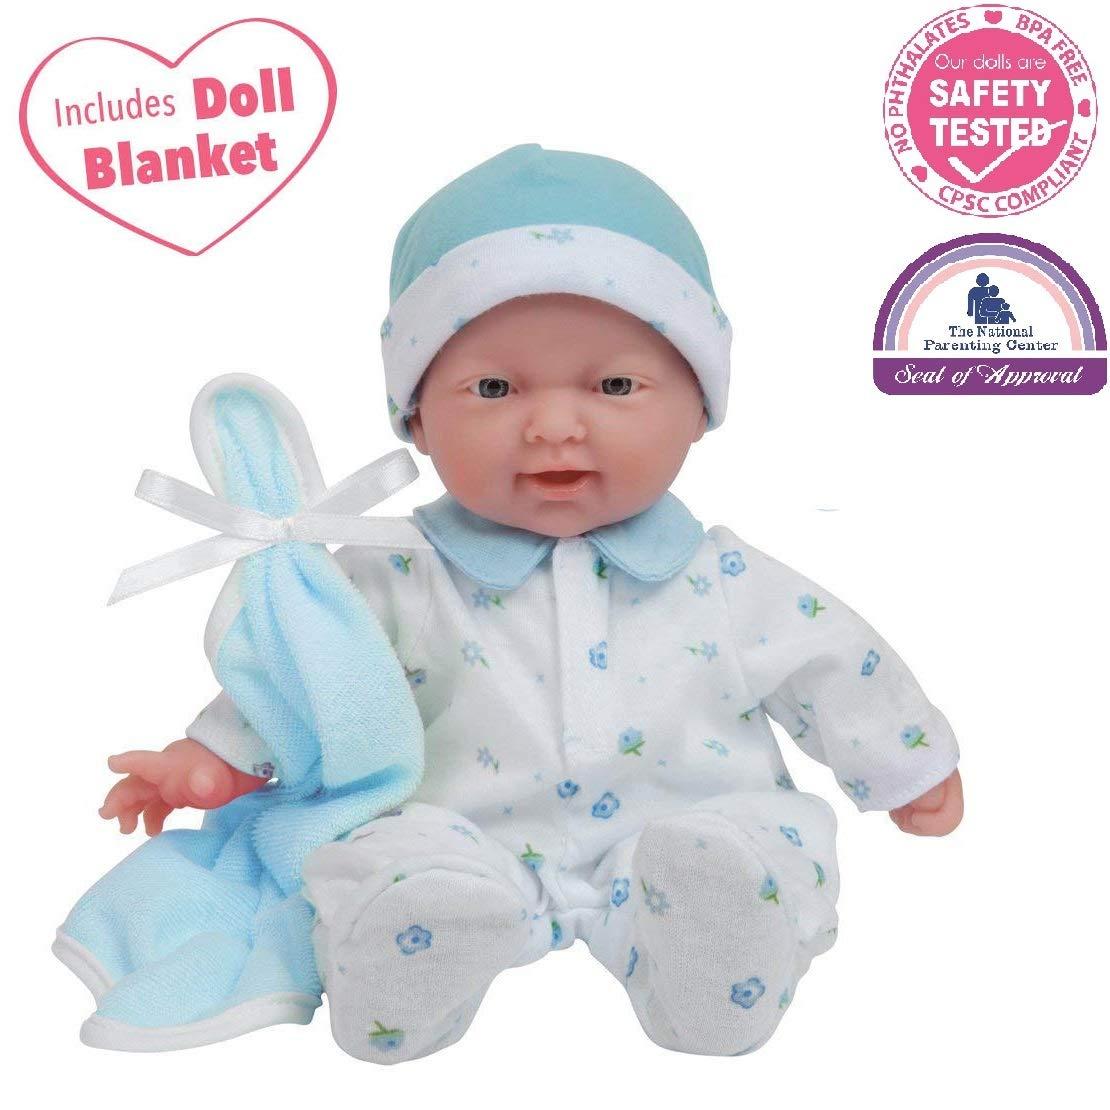 JC Toys, La Baby 11-inch Washable Soft Body Boy Play Doll for Kid